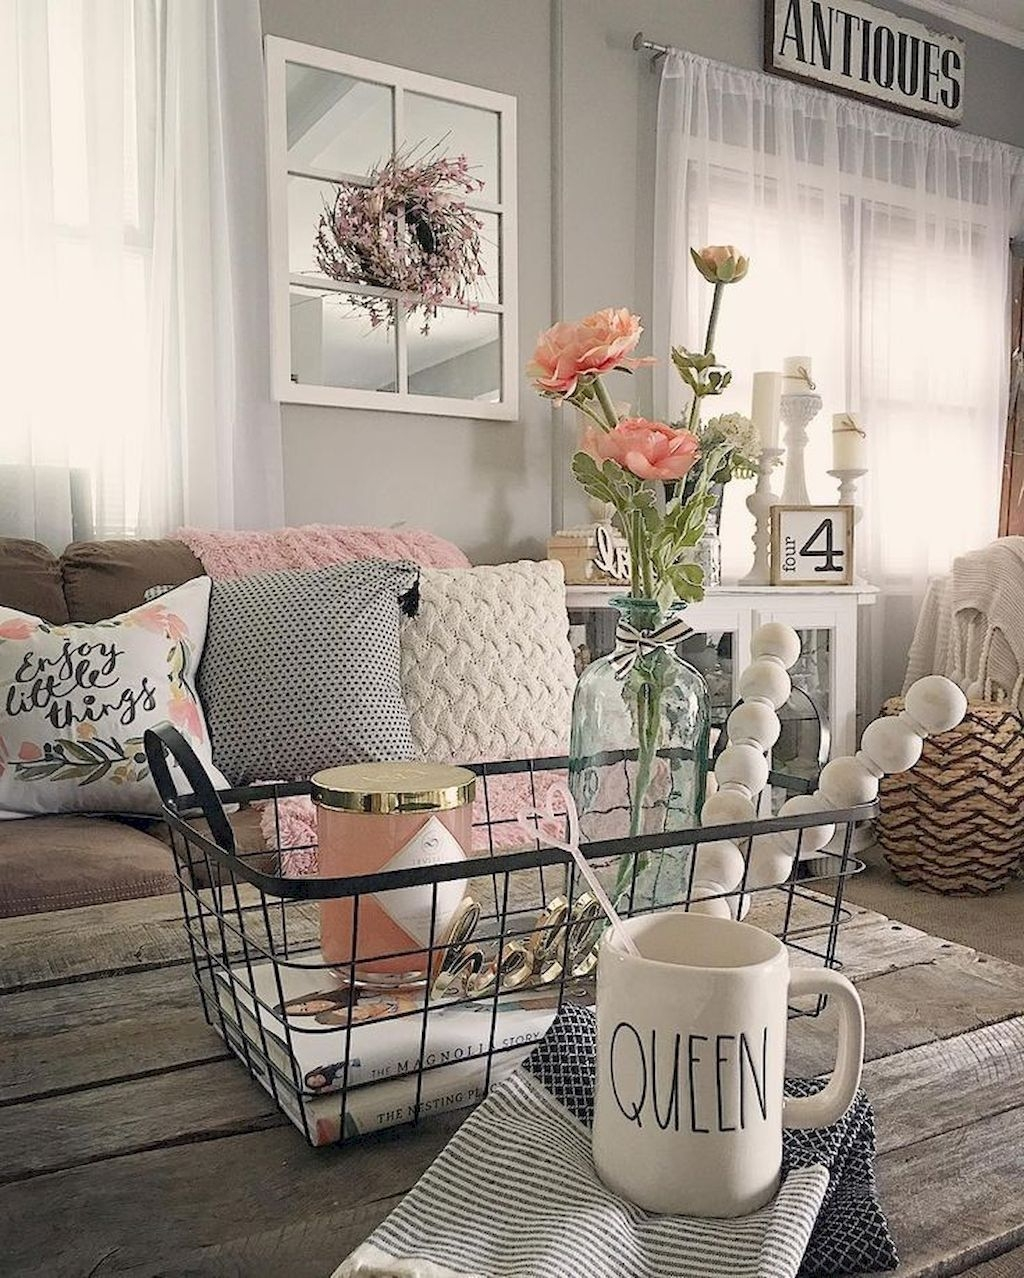 Romanic Rustic Style Decor Ideas 24